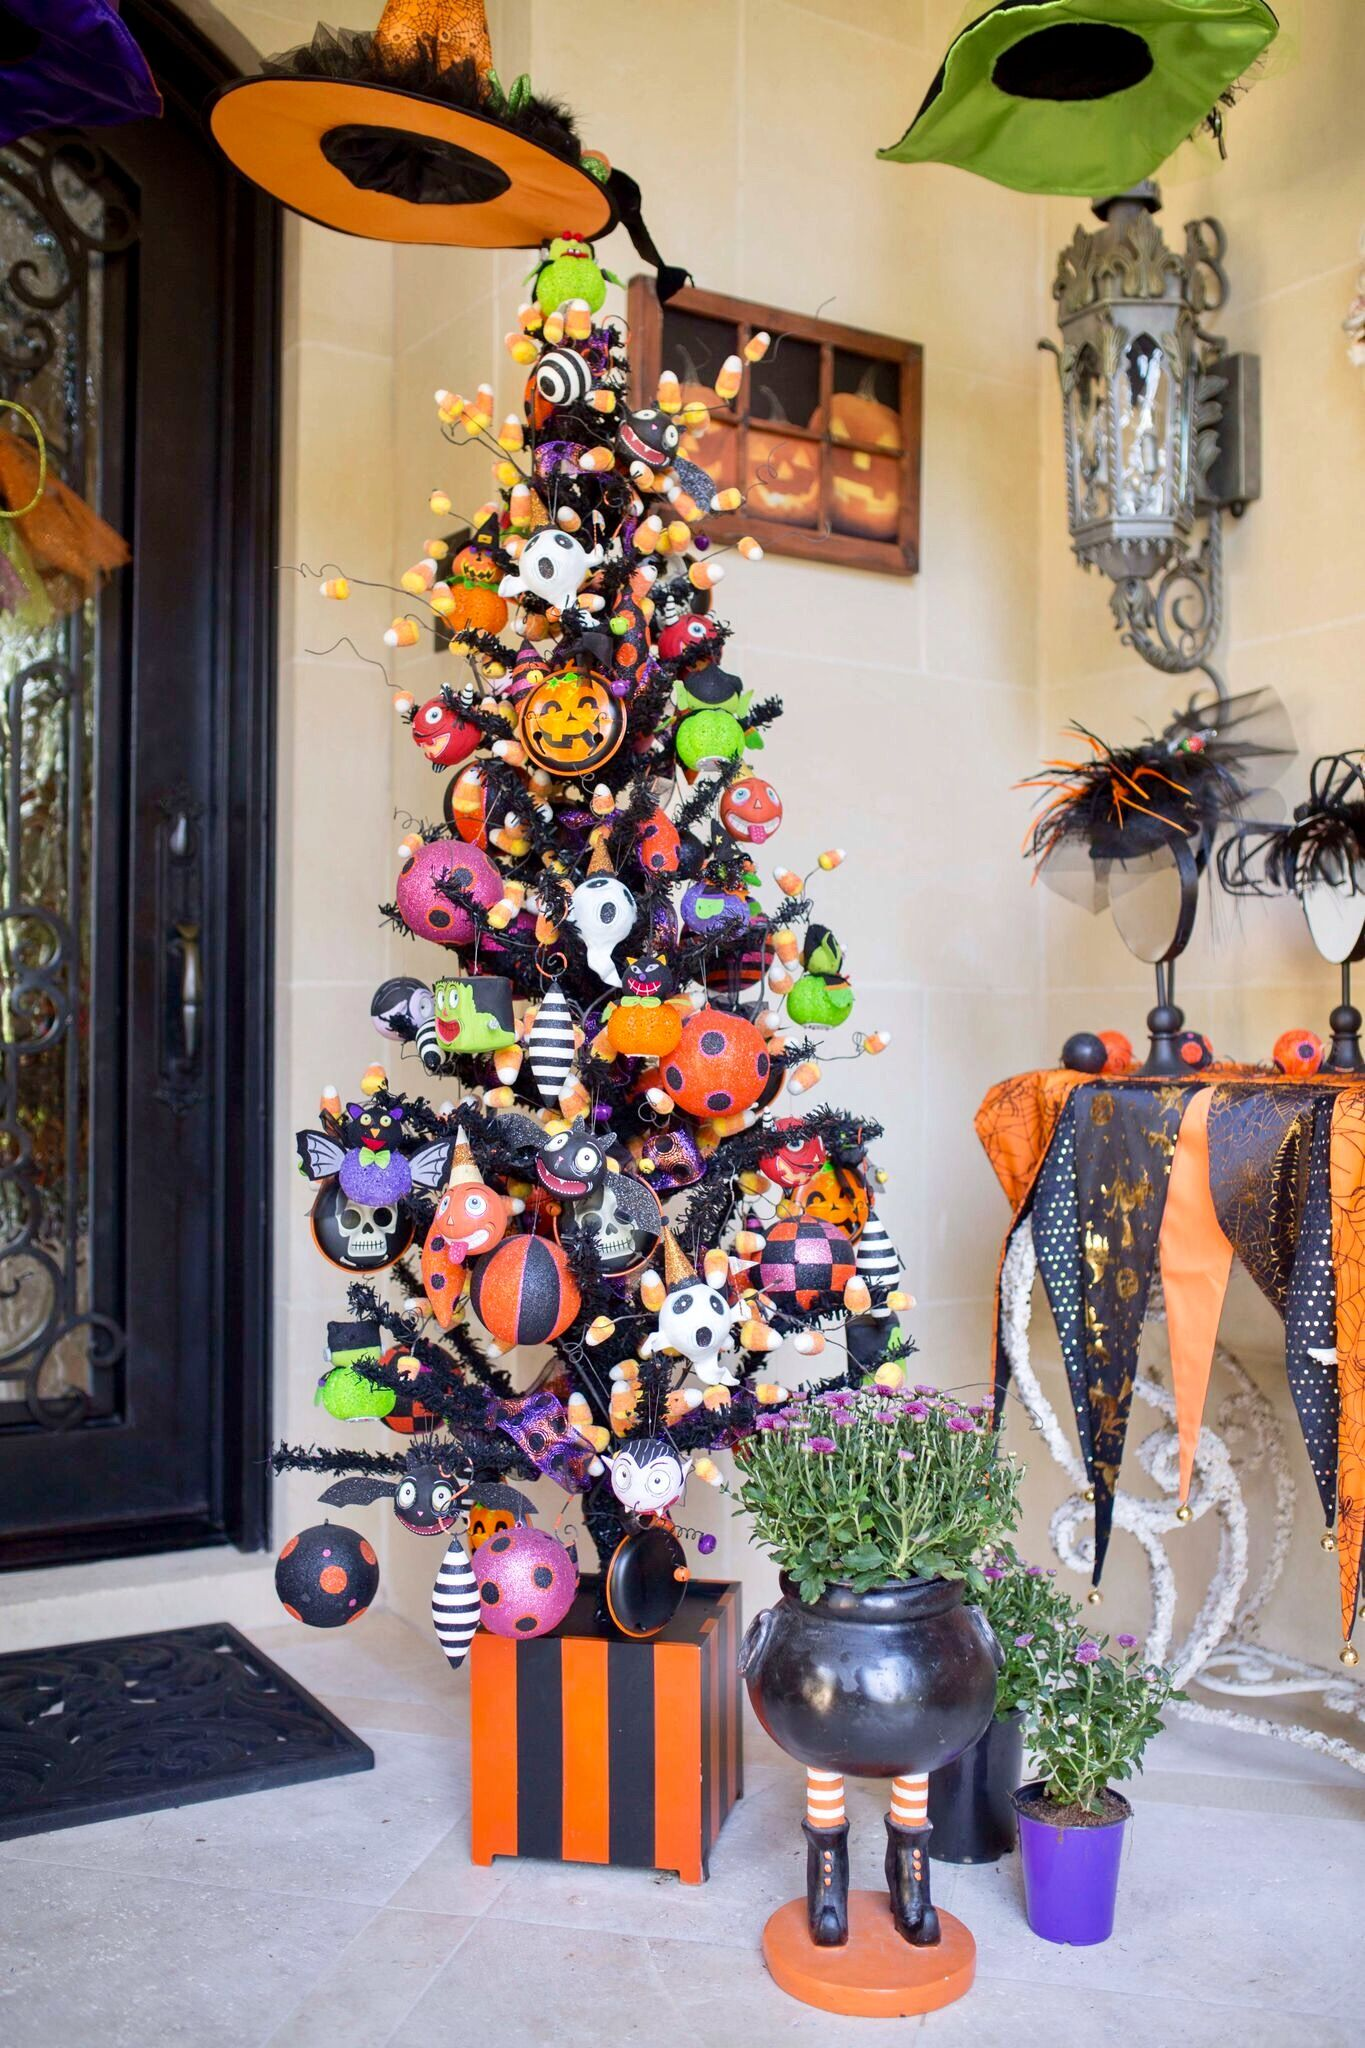 ⇢ 𝒇๏ℓℓ๏𝒘 🐝 rainmoneyy ⇠ (With images) Halloween tree